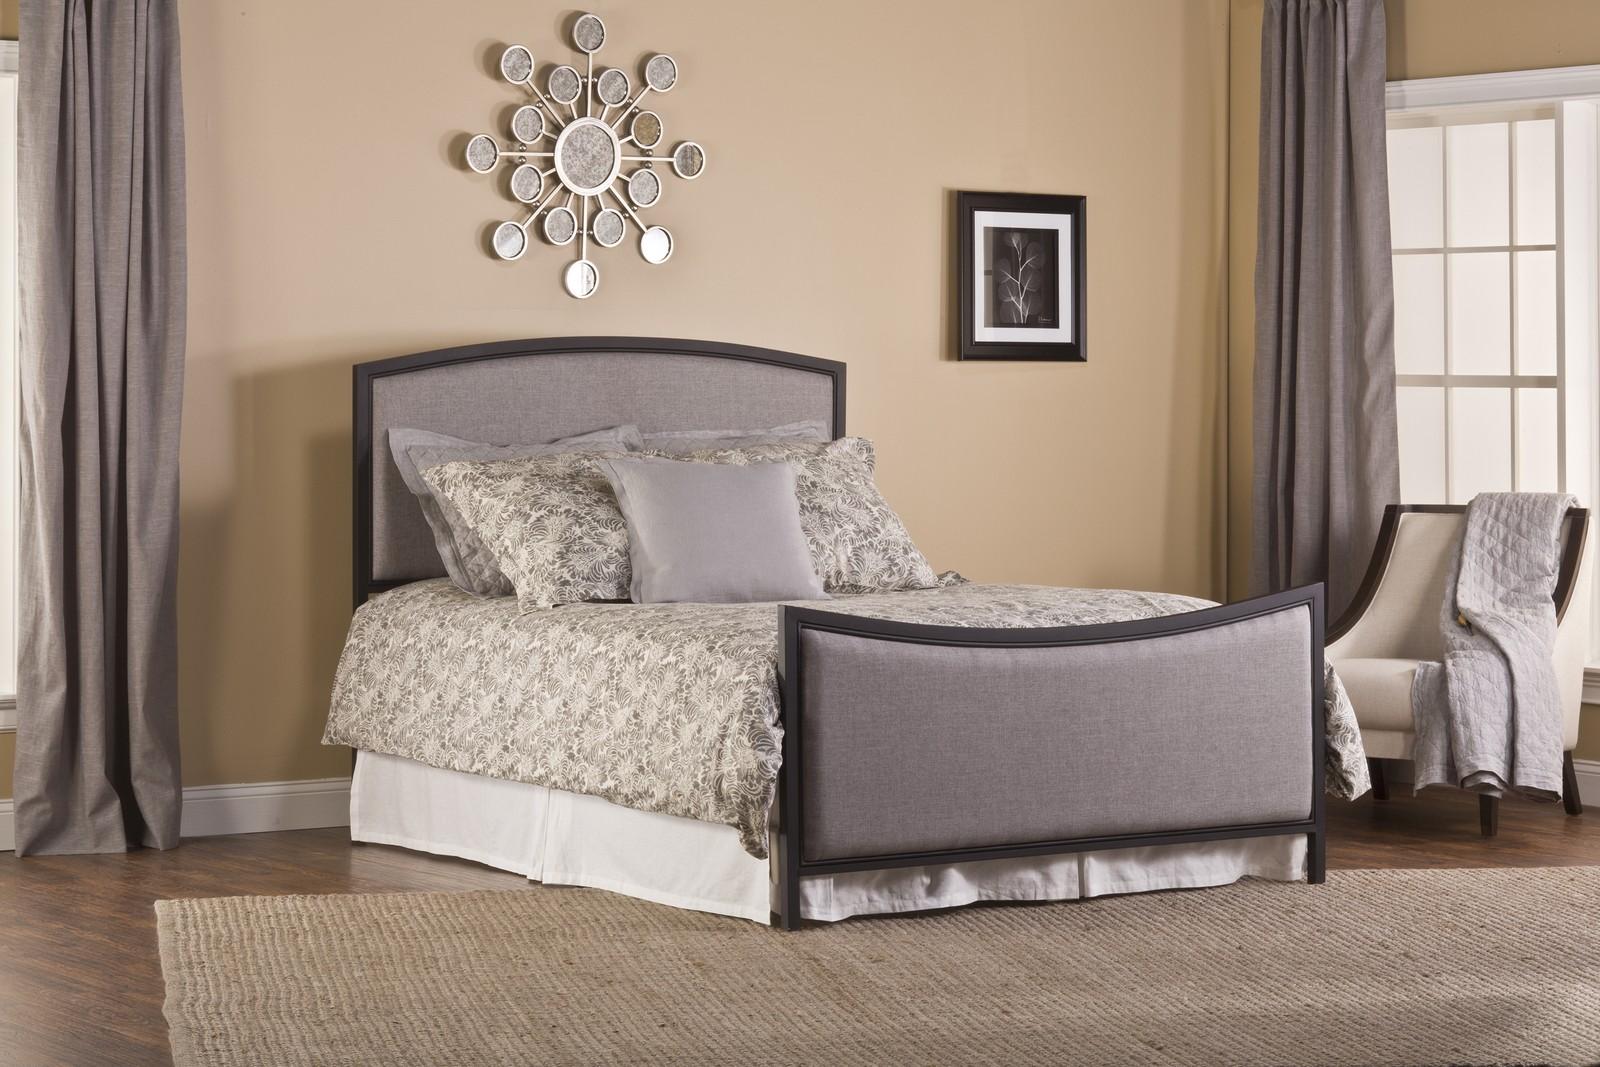 Hillsdale Bayside Bed Set - Textured Black - Grey